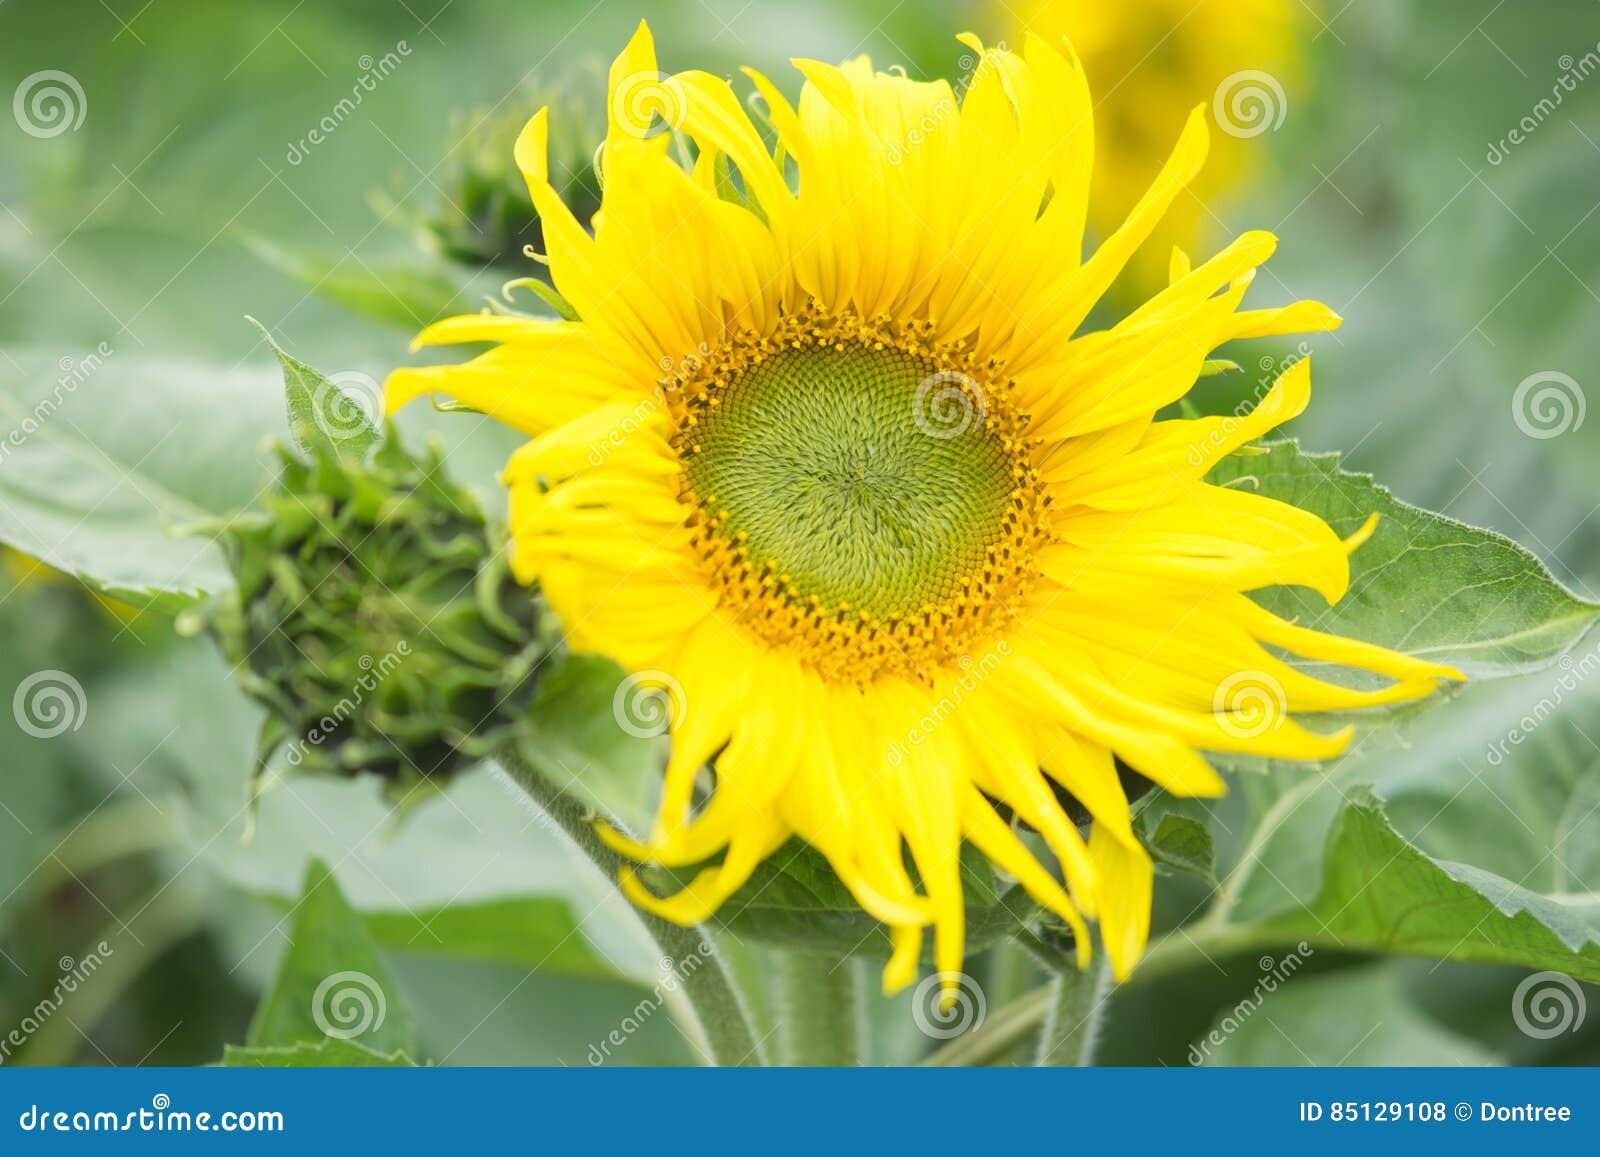 Blooming big sunflowers